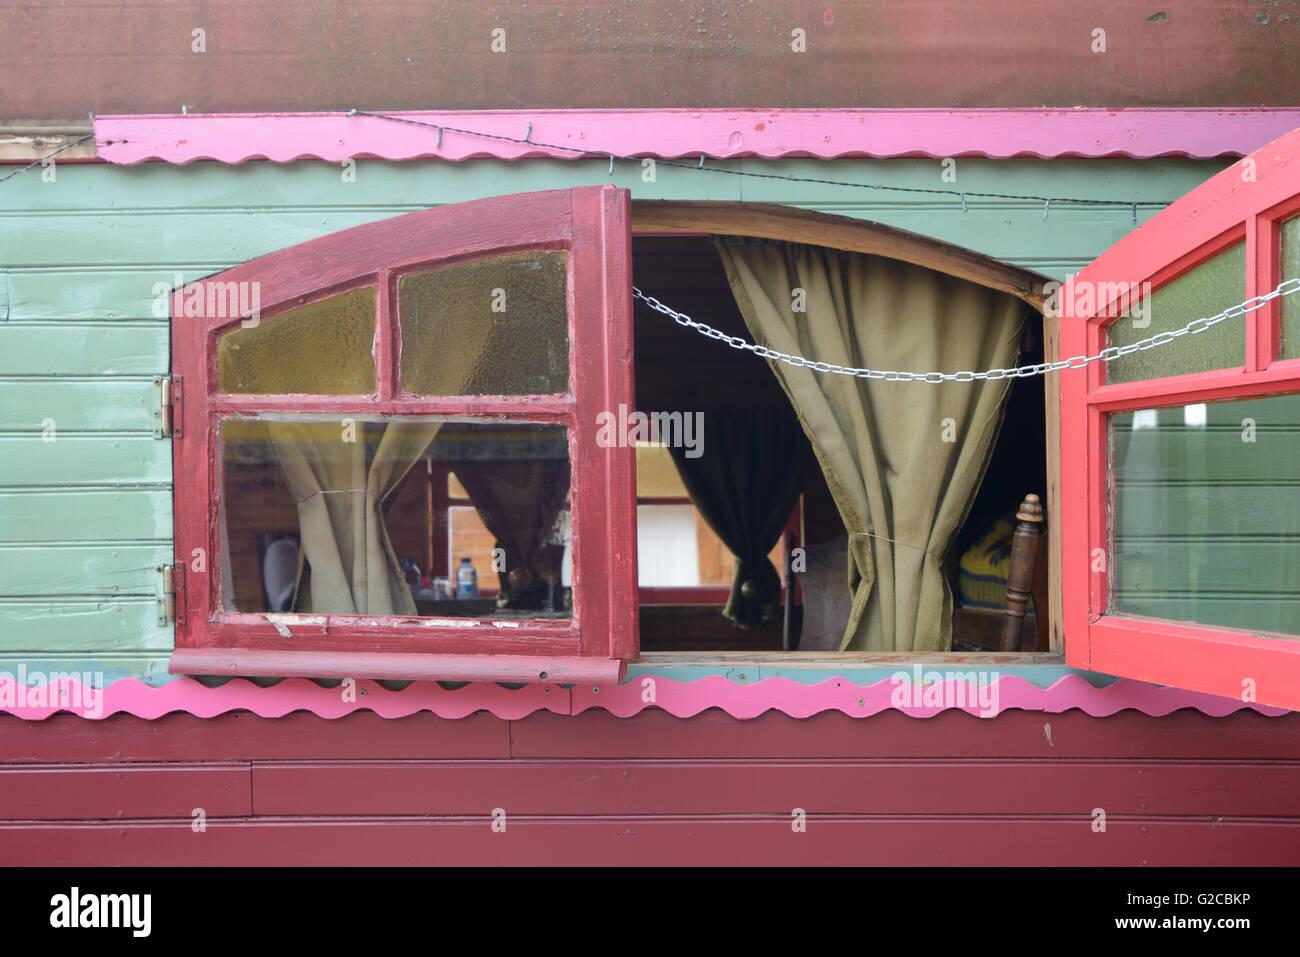 Painted Window of Colourful Gypsy Caravan, Romani Wagon or Vardo - Stock Image